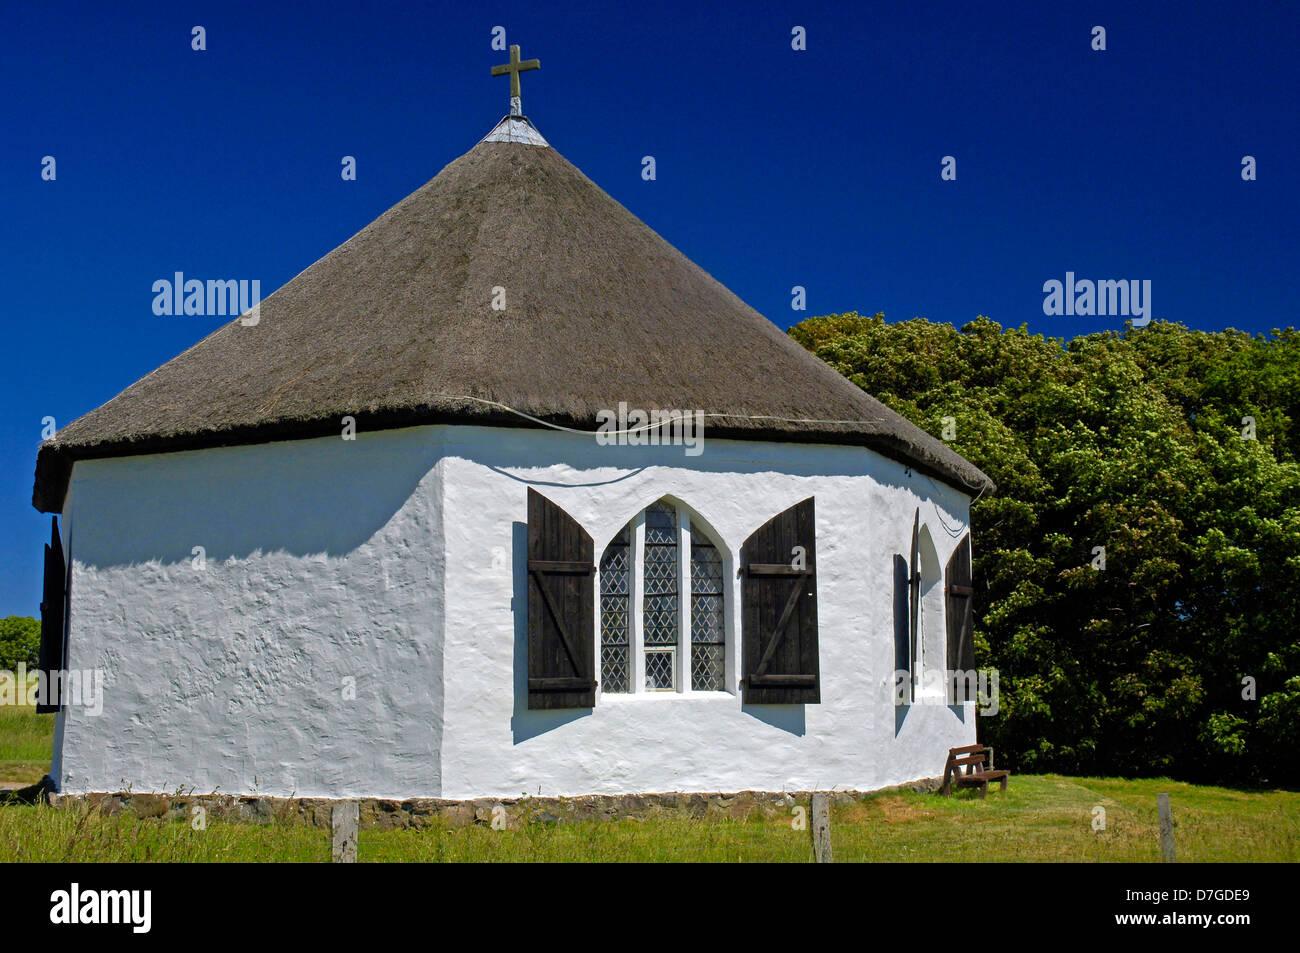 Germany, Mecklenburg-West Pomerania, island Rügen, cape Arkona, village Vitt, chapel, church - Stock Image